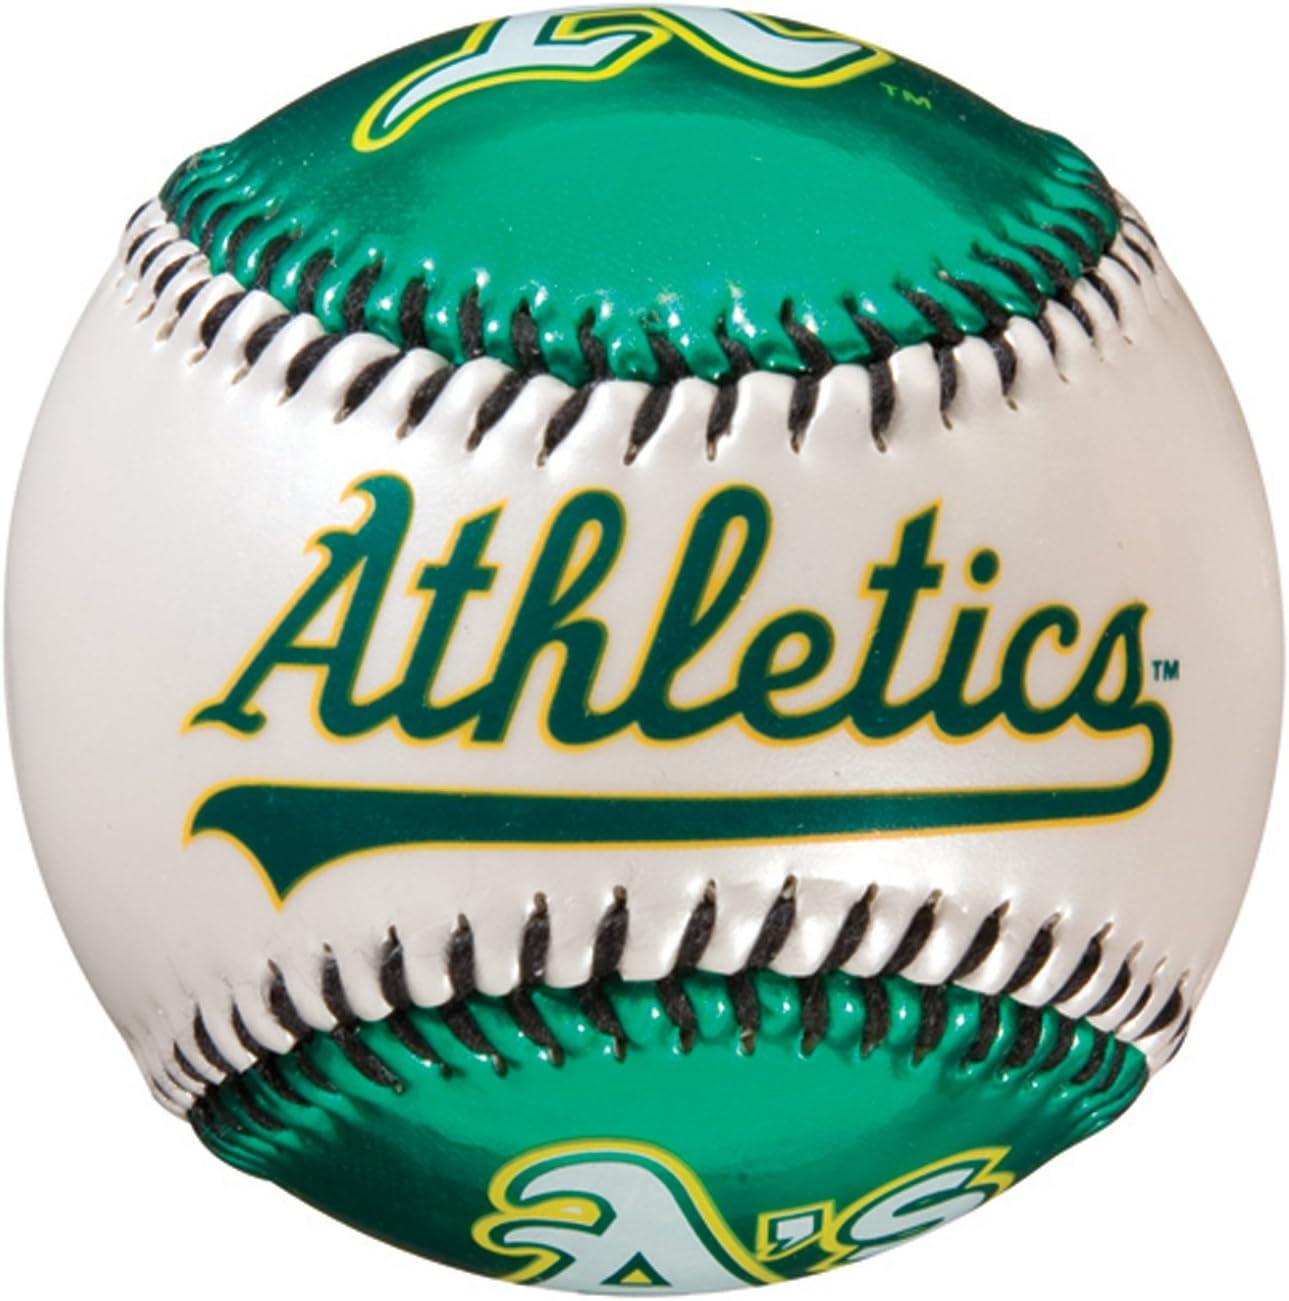 Franklin Sports MLB Team Baseball - MLB Team Logo Soft Baseballs - Toy Baseball for Kids - Great Decoration for Desks and Office